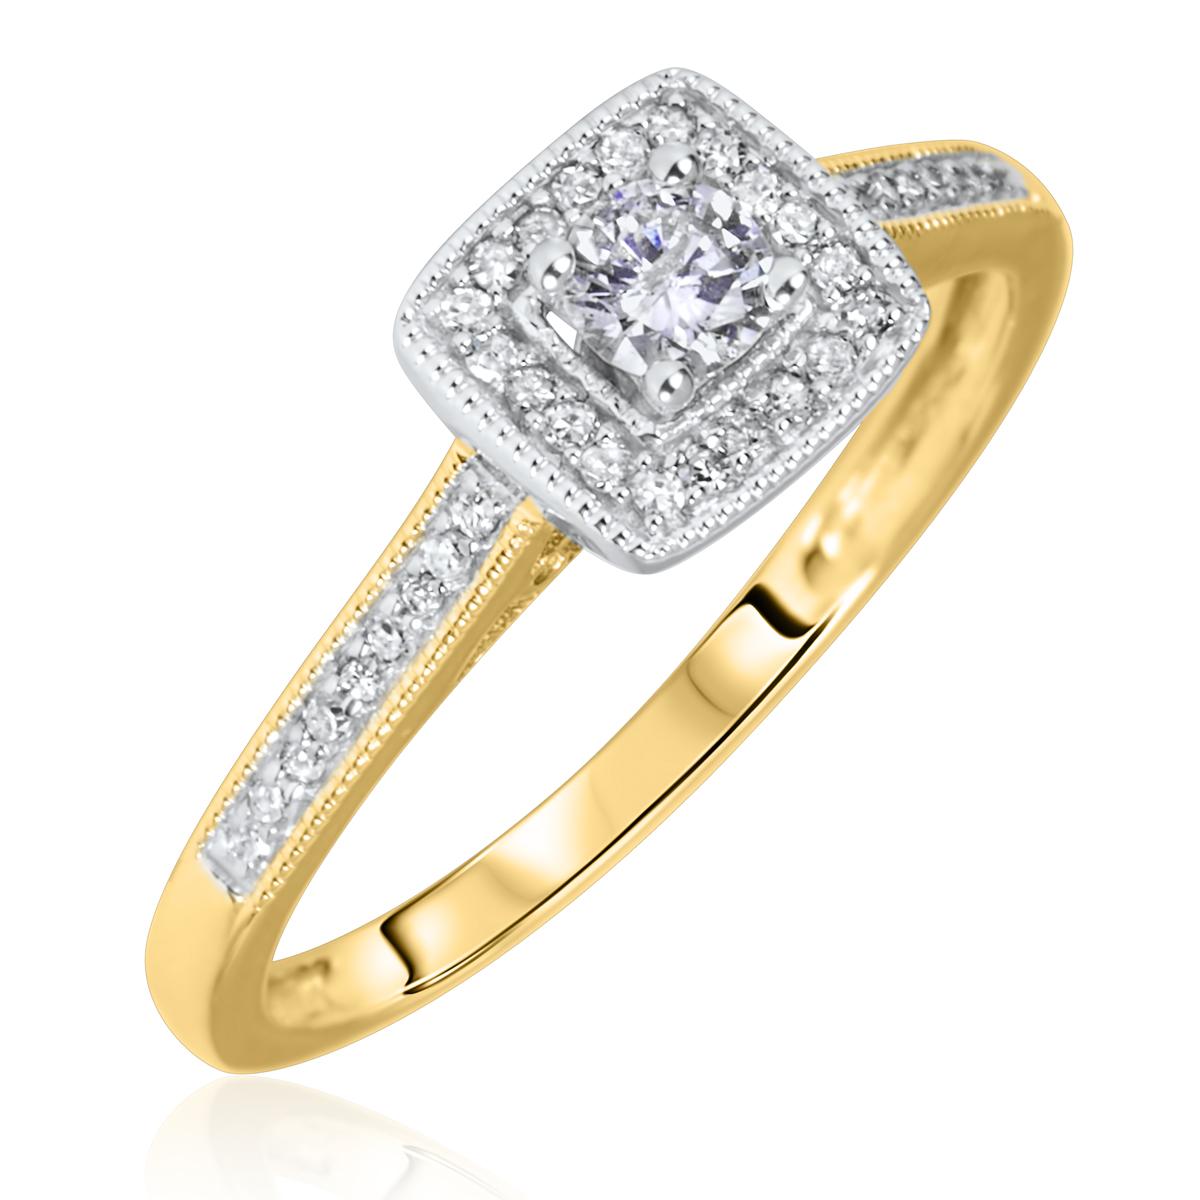 1/5 Carat T.W. Round Cut Diamond Ladies Engagement Ring 14K Yellow Gold- Size 8